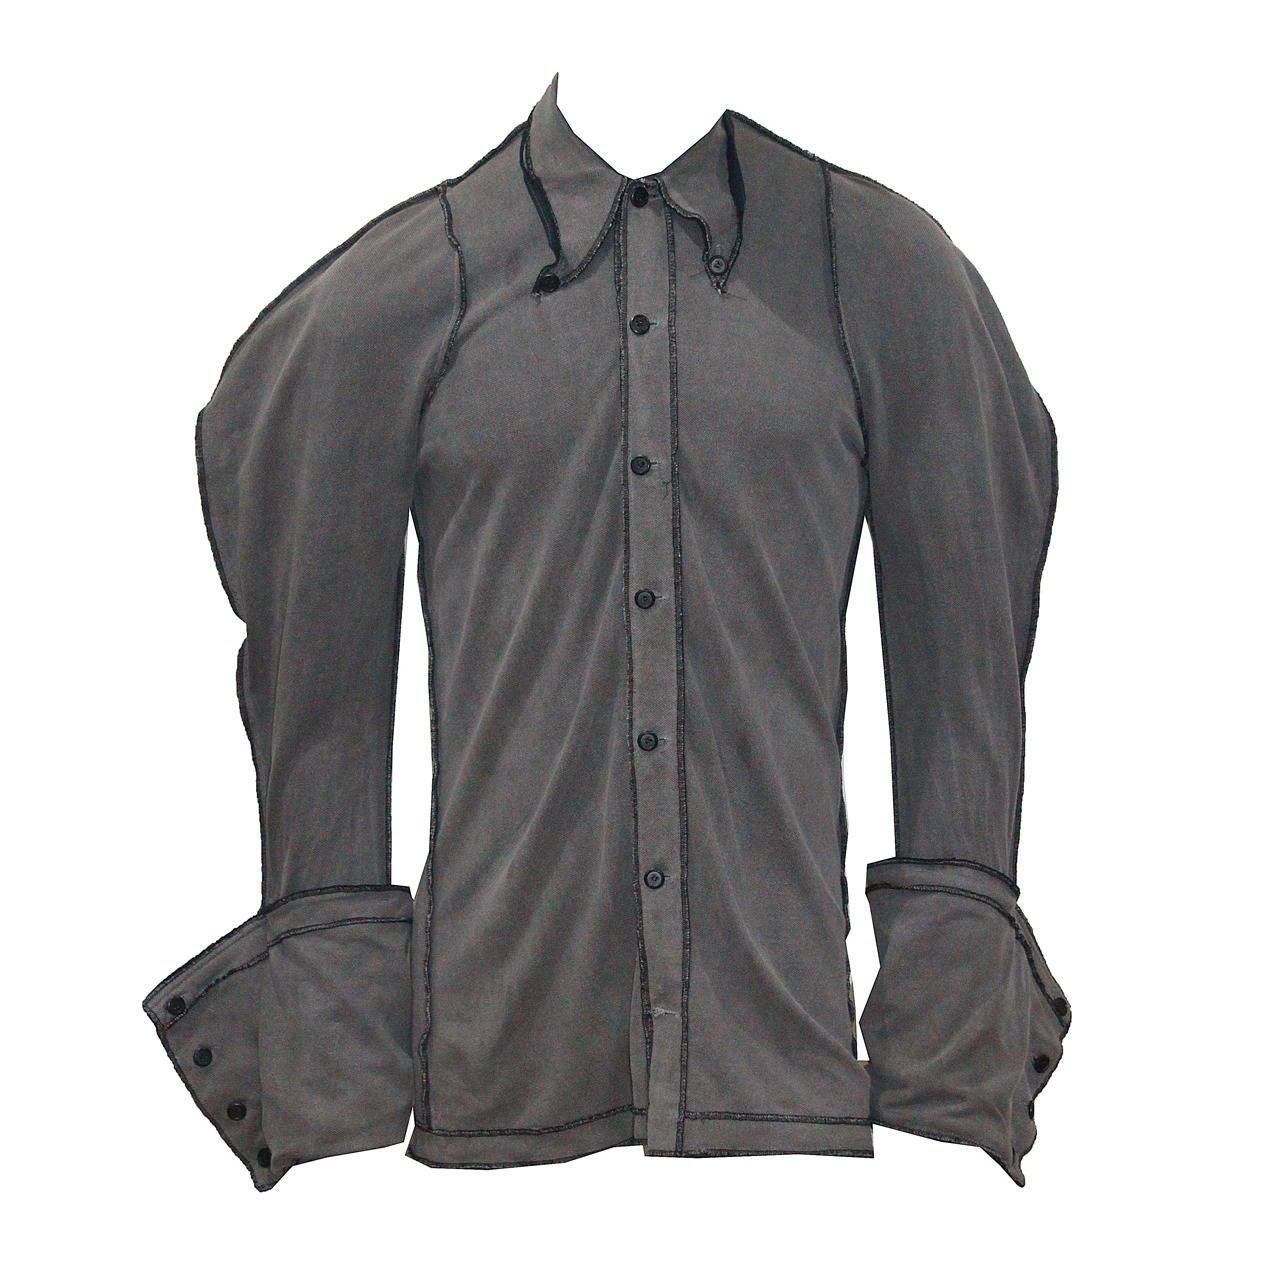 Mens Rare Christopher Nemeth Shirt For Sale at 1stdibs